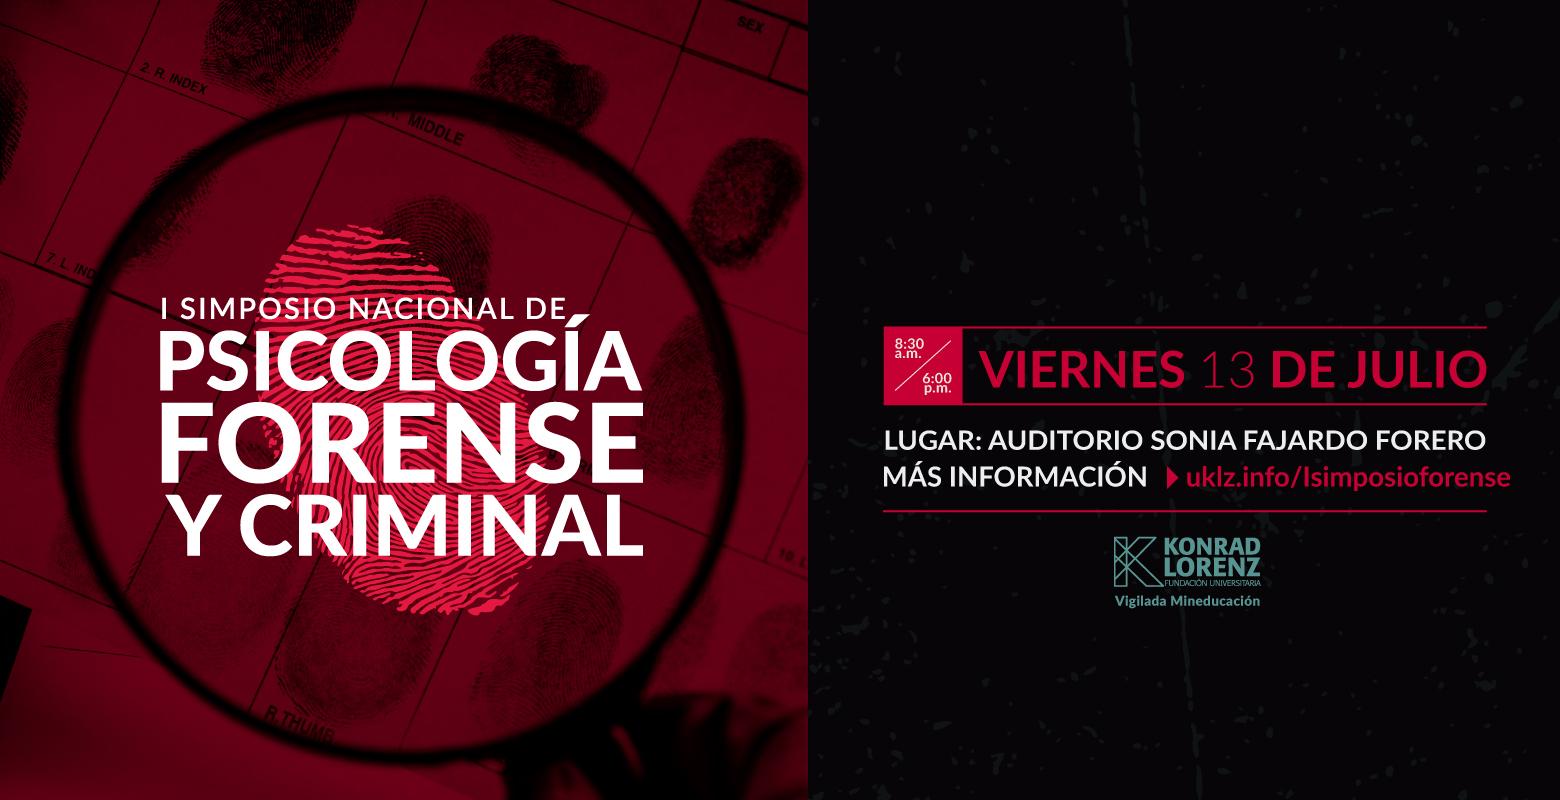 I Simposio Nacional de Psicología Forense Criminal